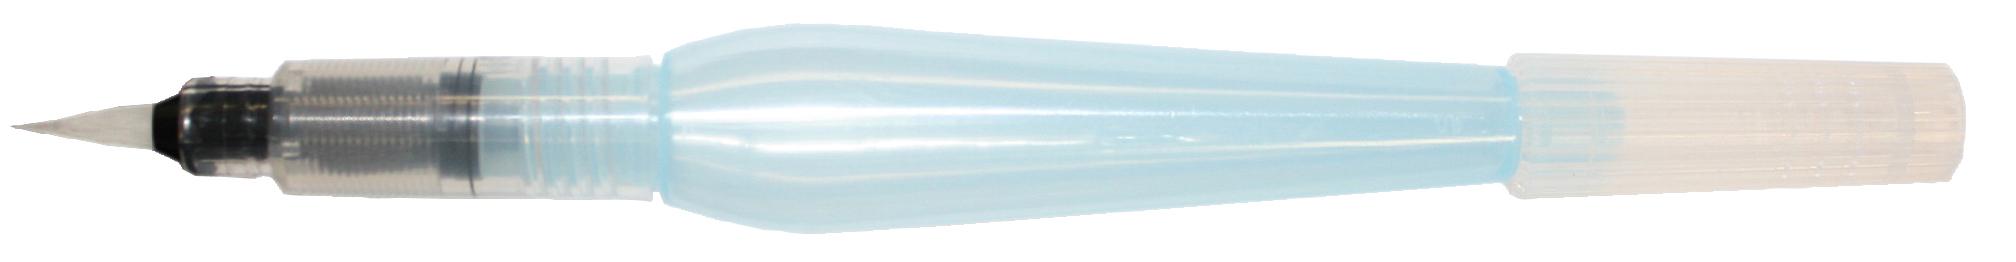 Кисть с резервуаром для Aquash Brush in bulk средняя